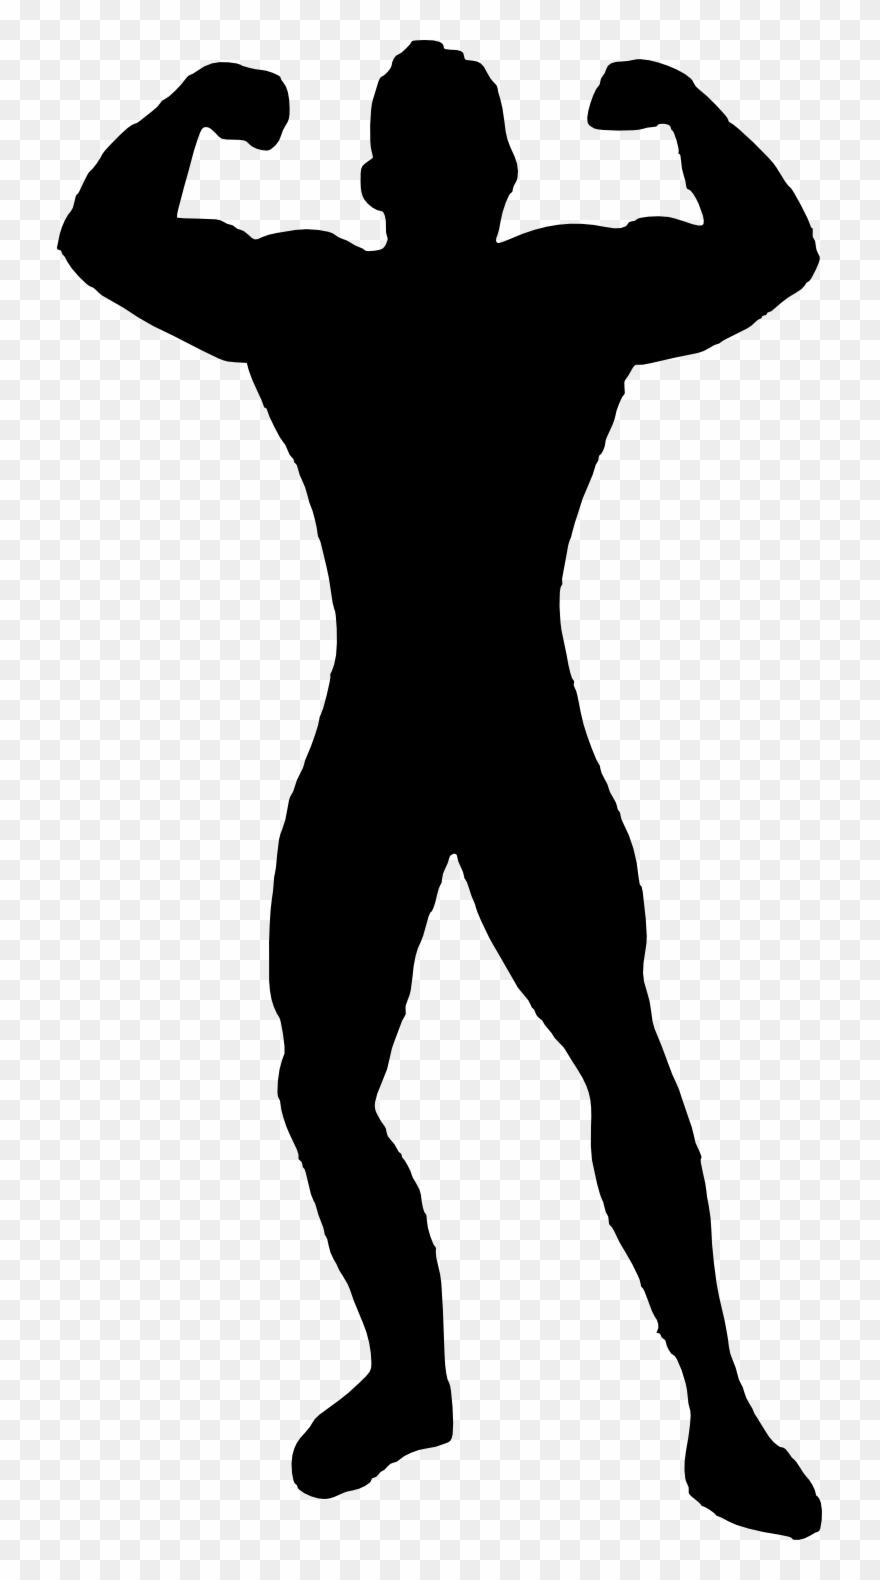 Muscle Man Bodybuilder Silhouette.